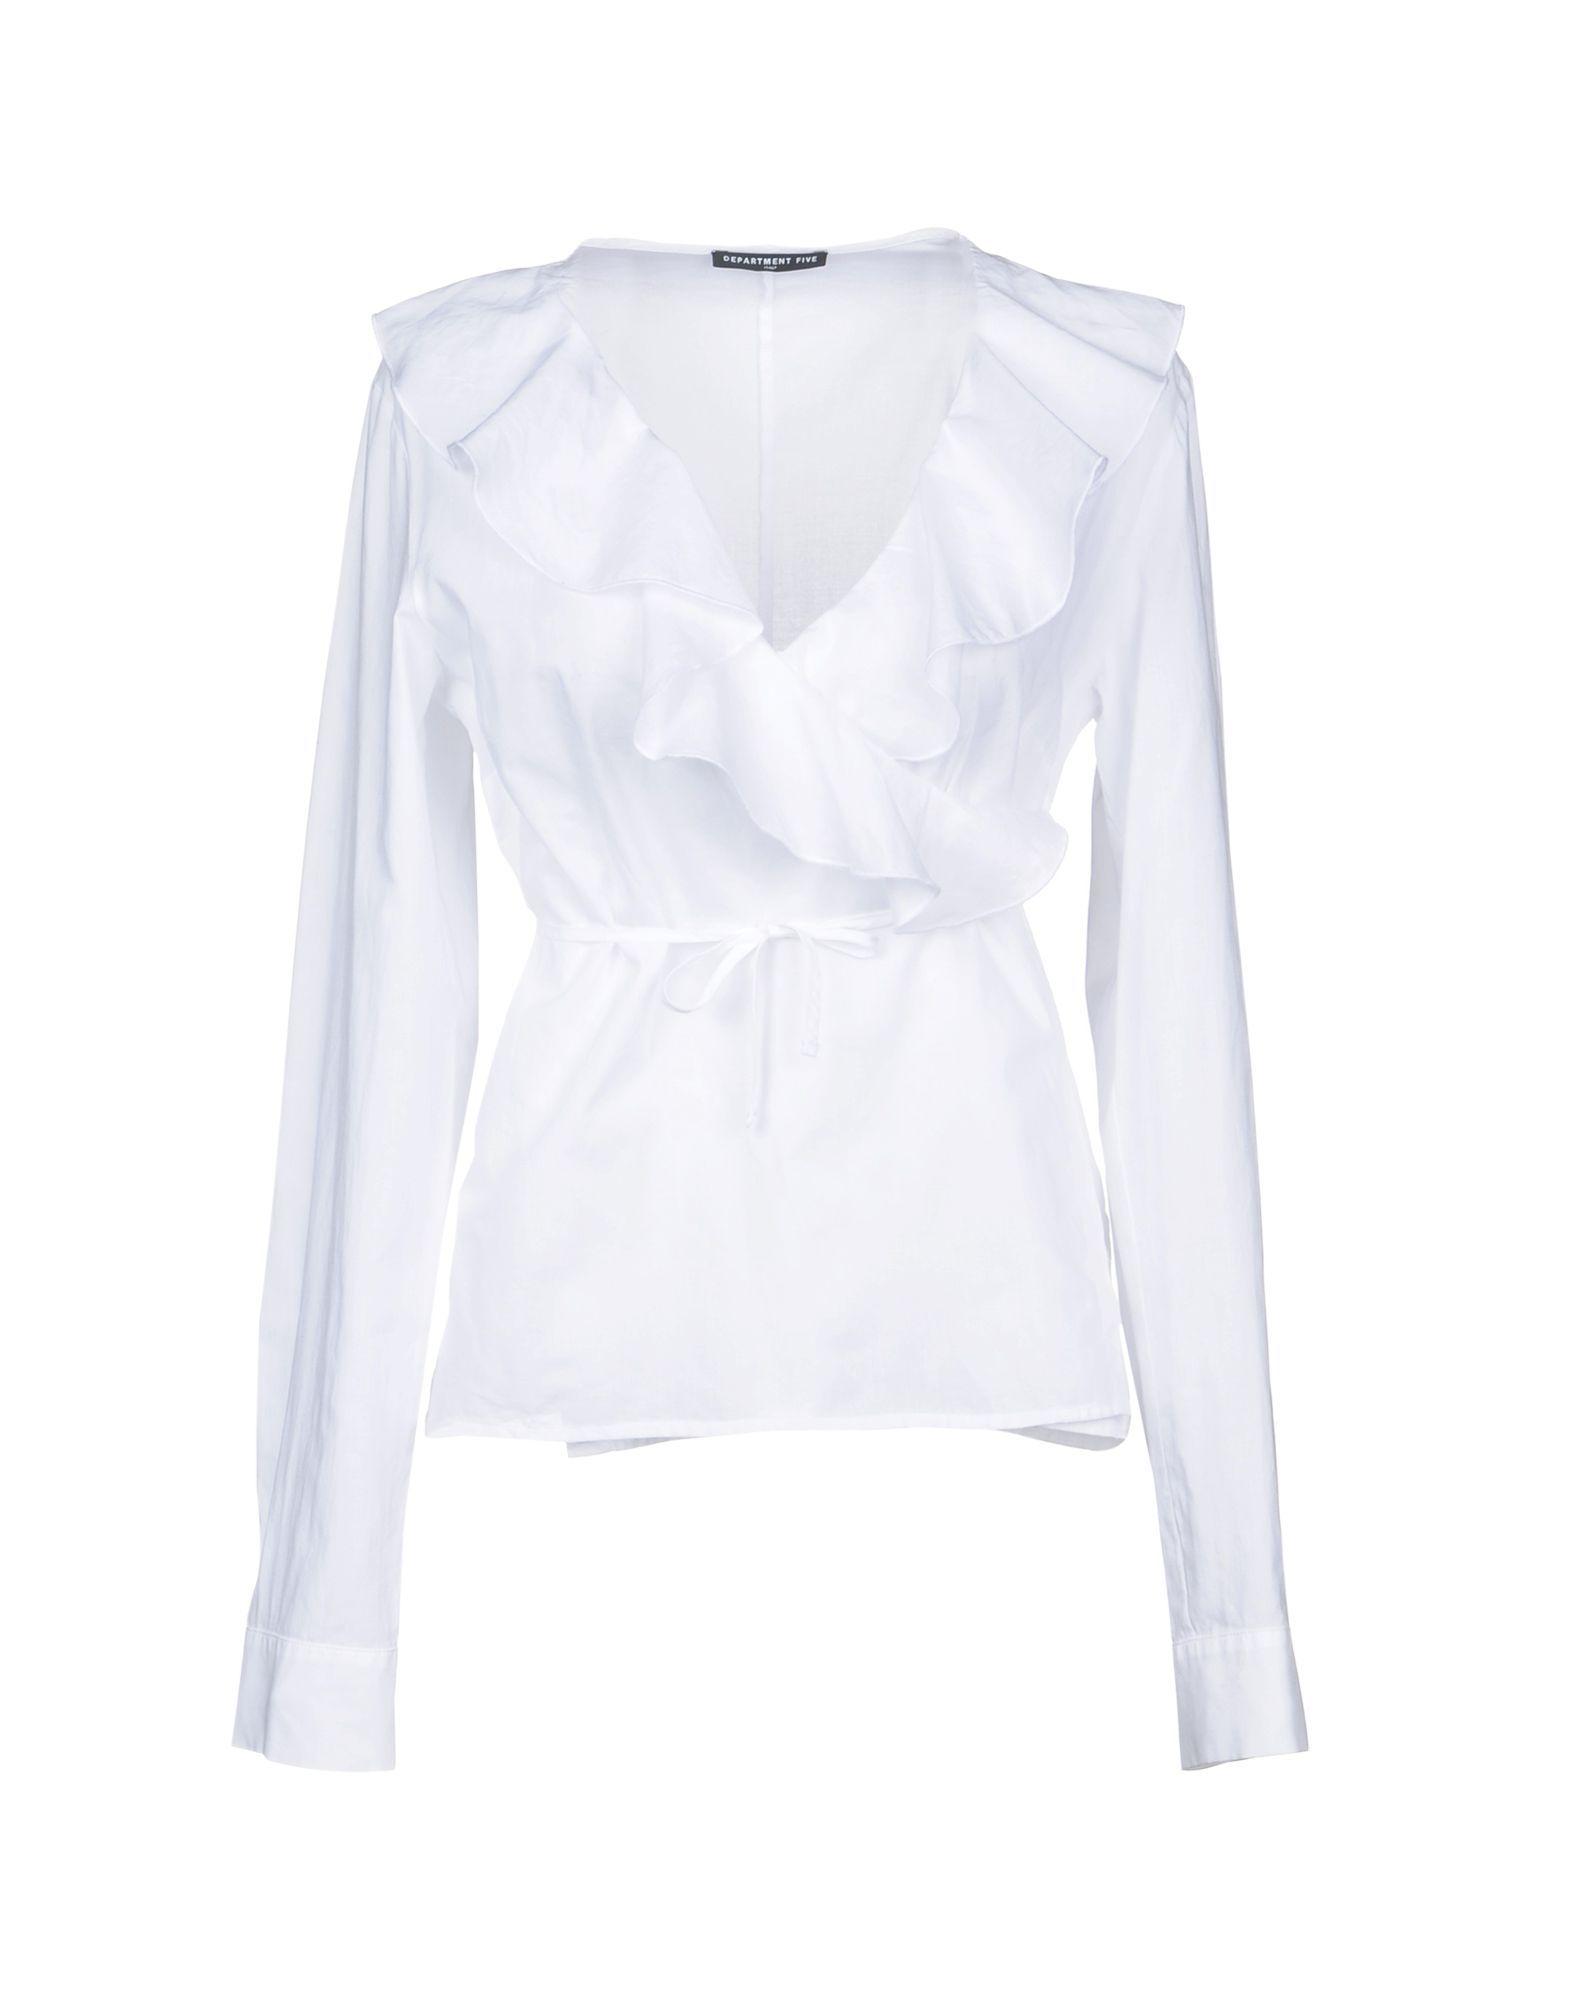 SHIRTS Department 5 White Woman Cotton